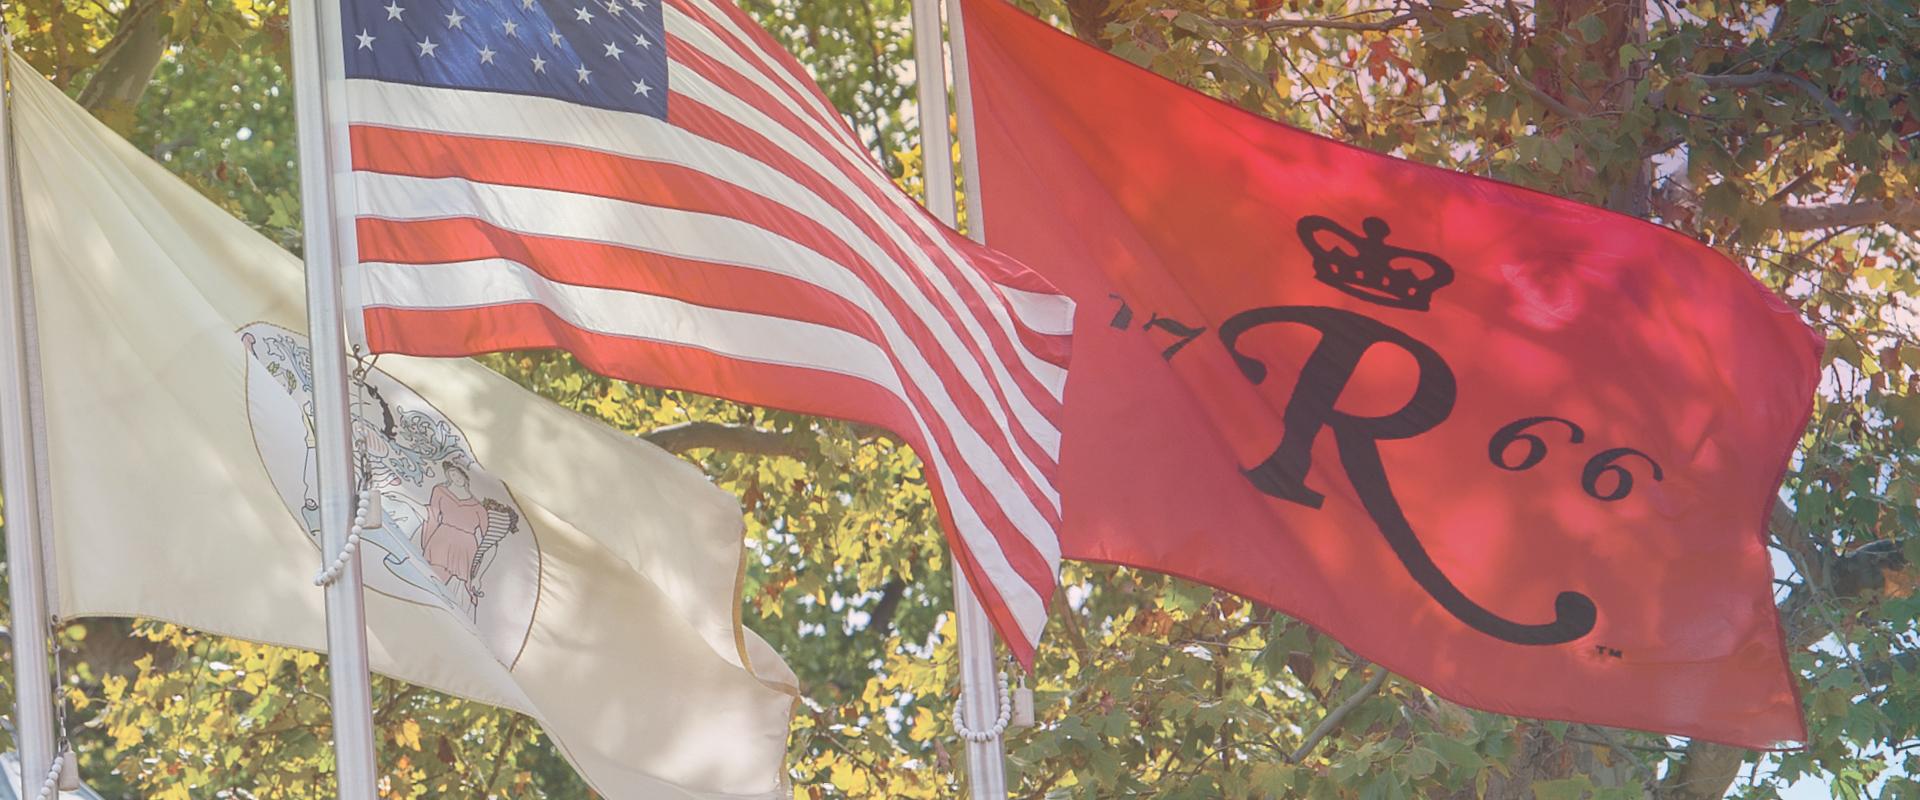 American flag, New Jersey flag, Rutgers flag